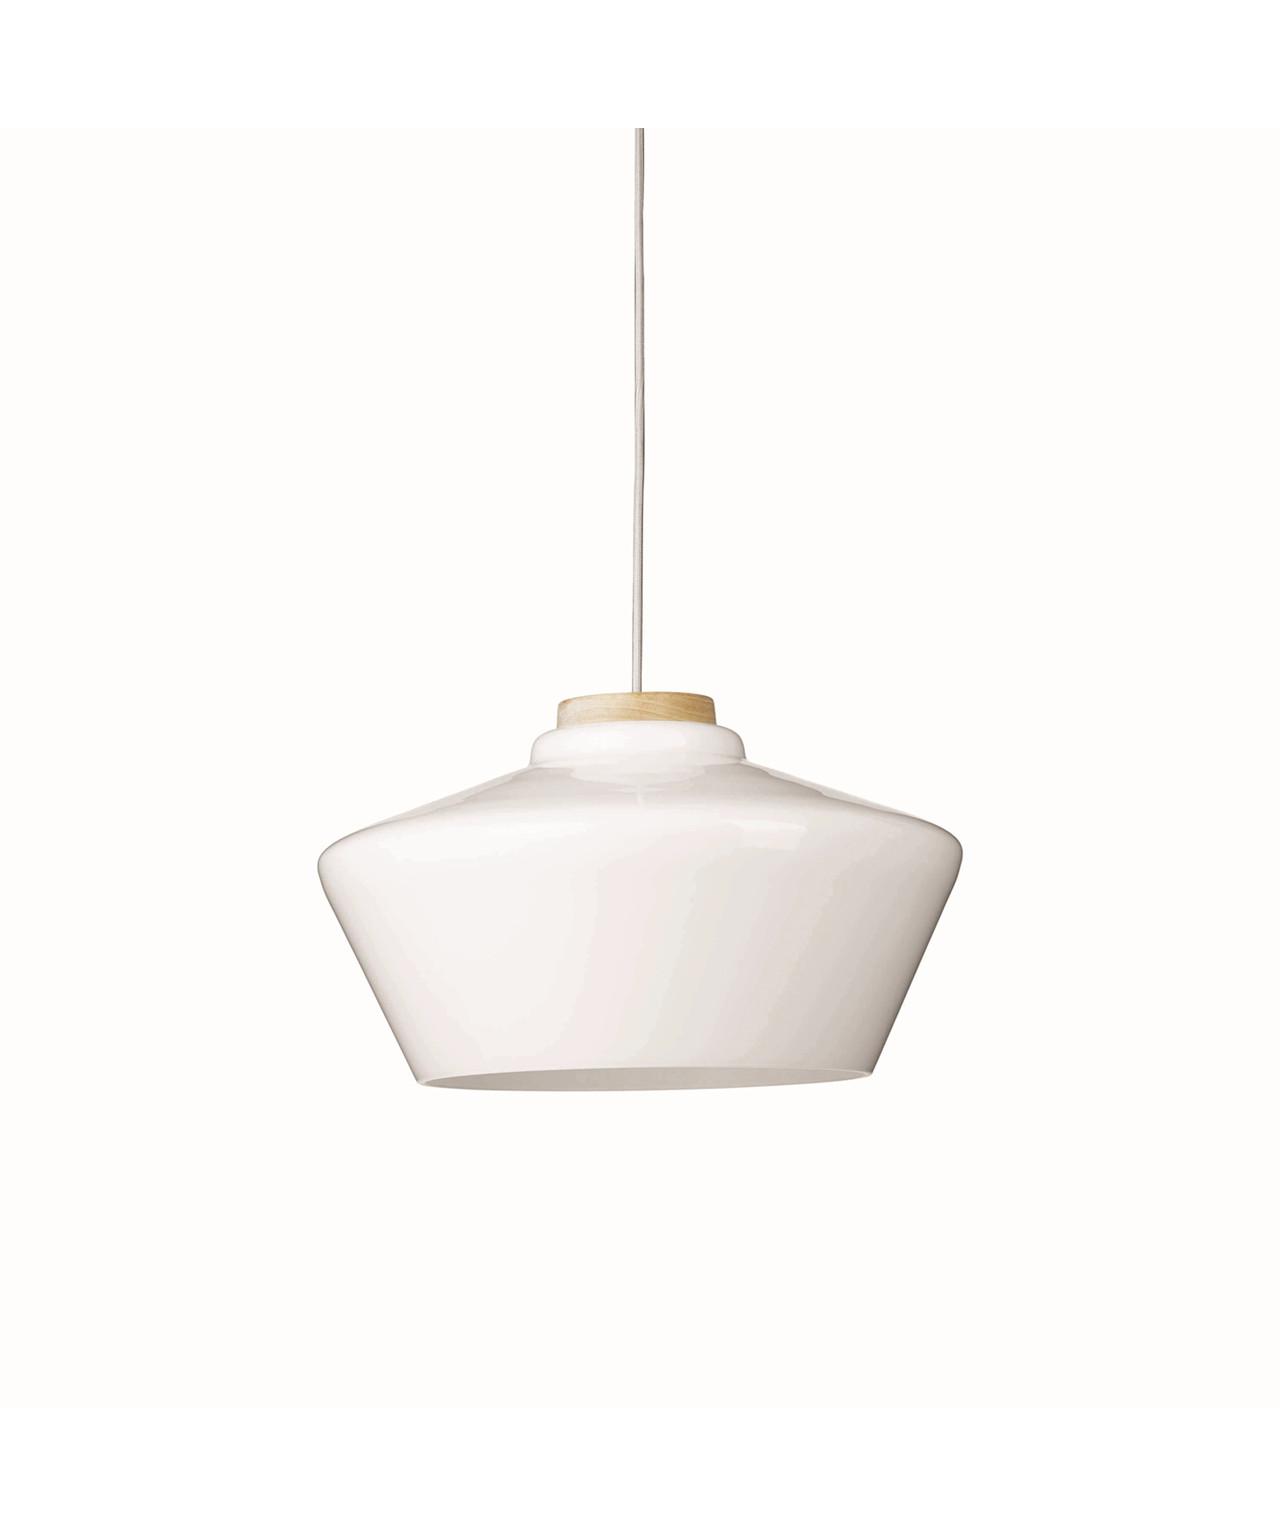 Nuuk Taklampa Ø41 - Watt A Lamp